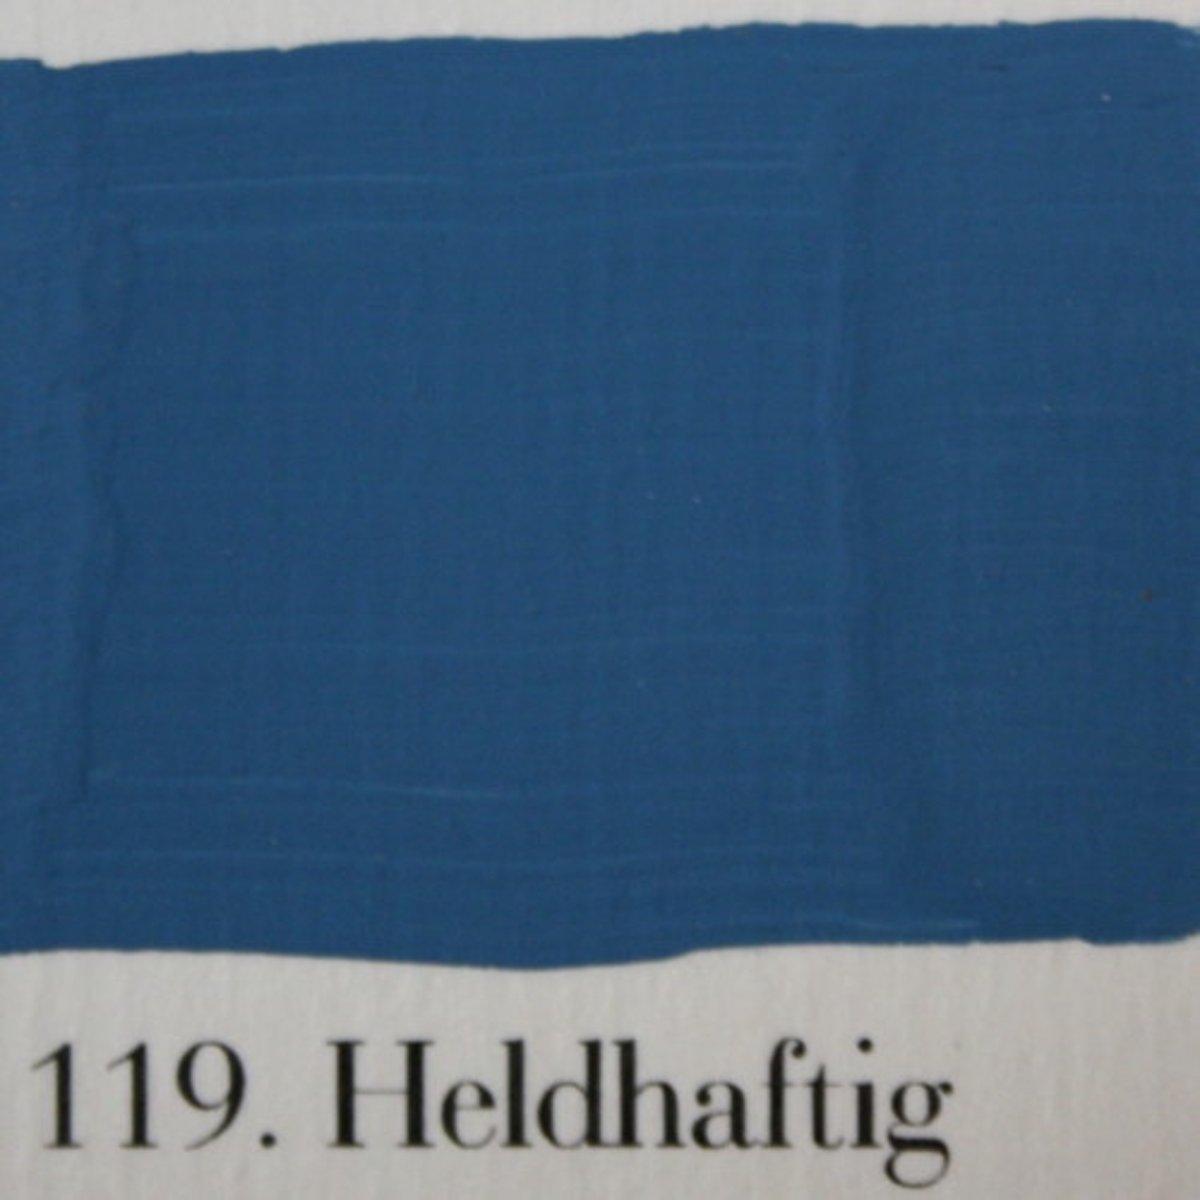 l'Authentique kleur 119.heldhaftig